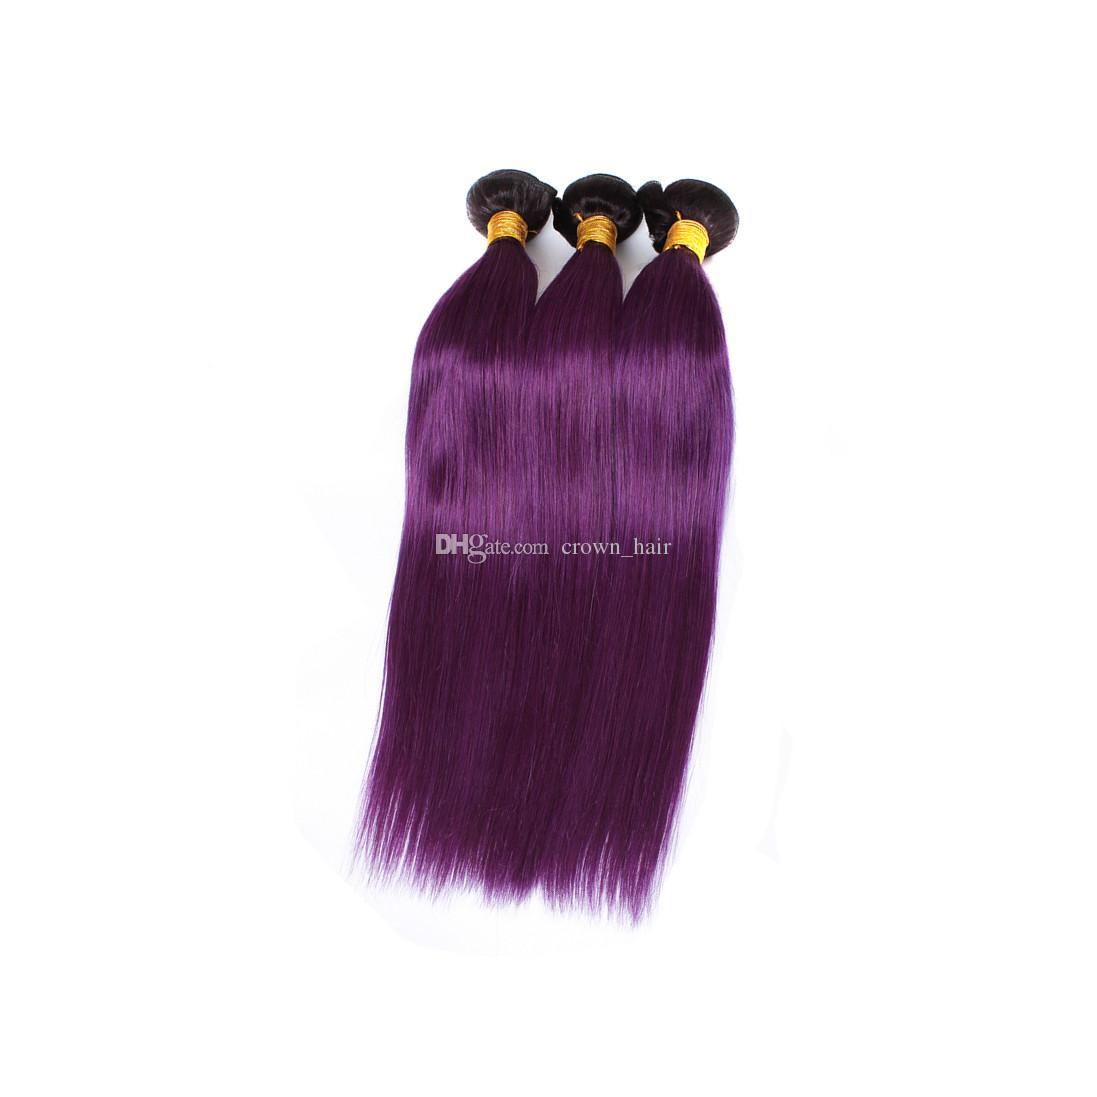 Dark Root Two Tone Malaysian Human Hair Bundles # 1B Púrpura Straight Human Hair Extensions Ombre Purplr Hair Weaves Double Wefted